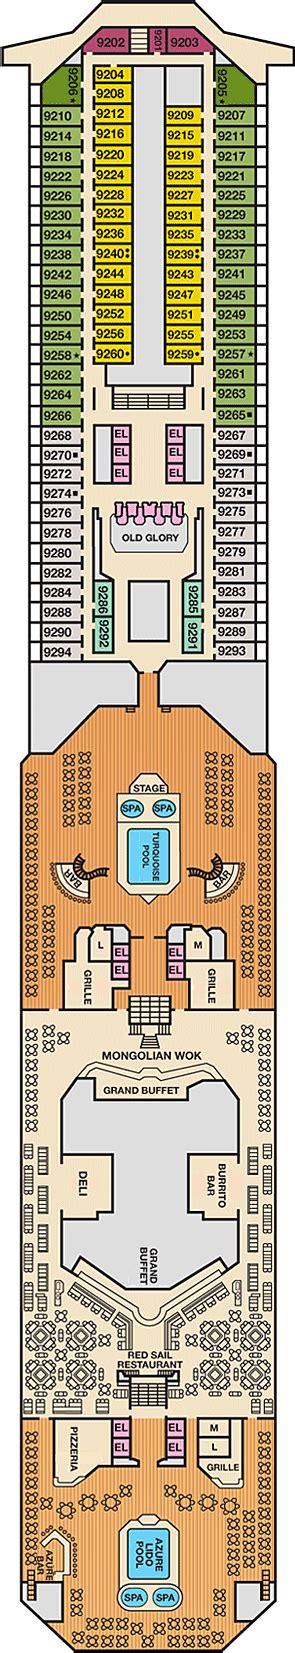 Carnival Splendor Lido Deck Plan by Carnival Lido Deck Deck Plan Carnival Deck 9